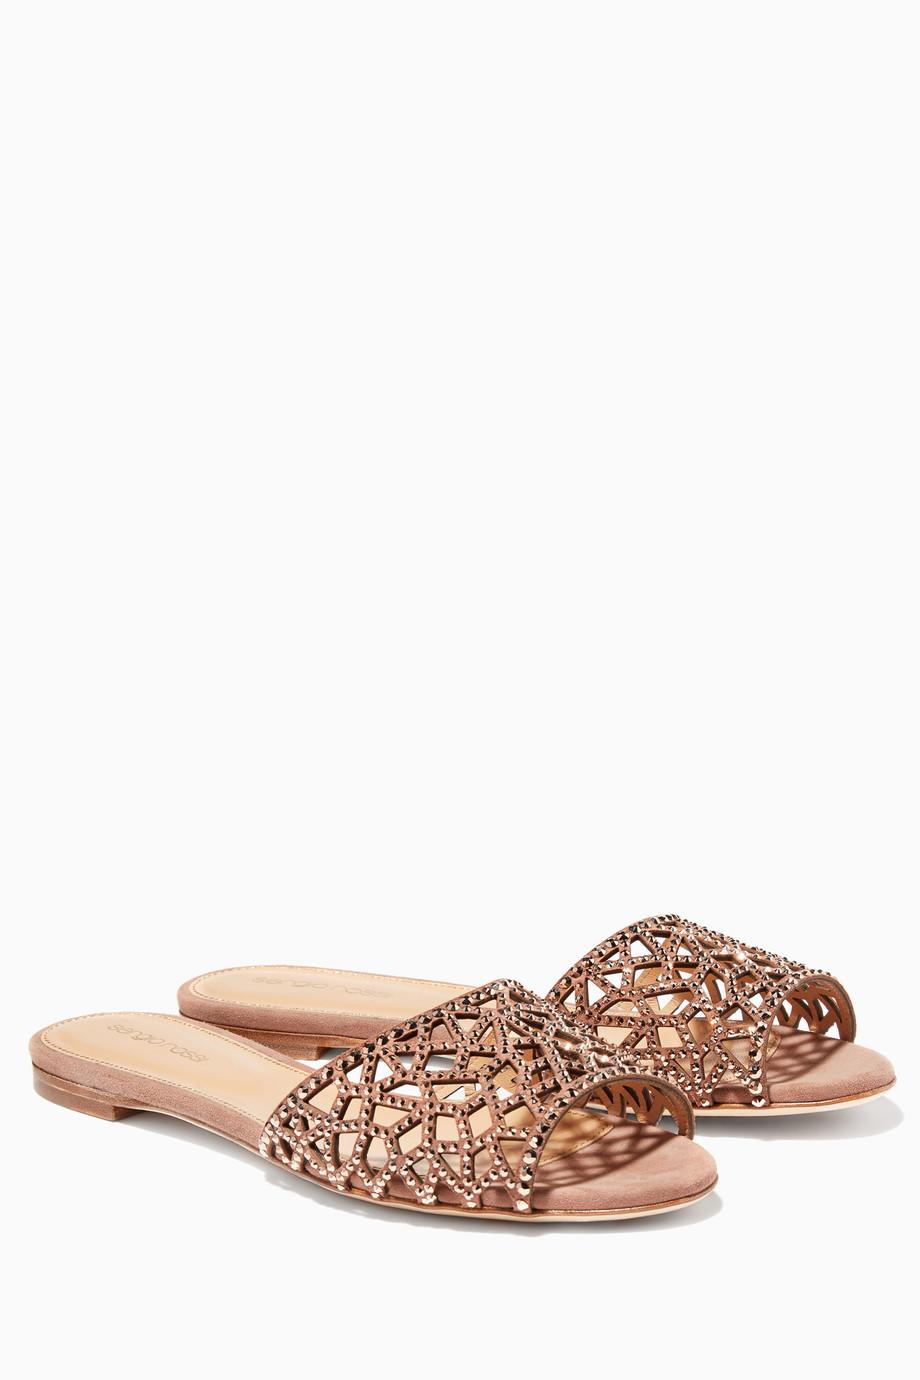 3d3d1a7d1f9d Shop Neutral Light Beige Tresor Swarovski Crystal Flat Sandals for ...